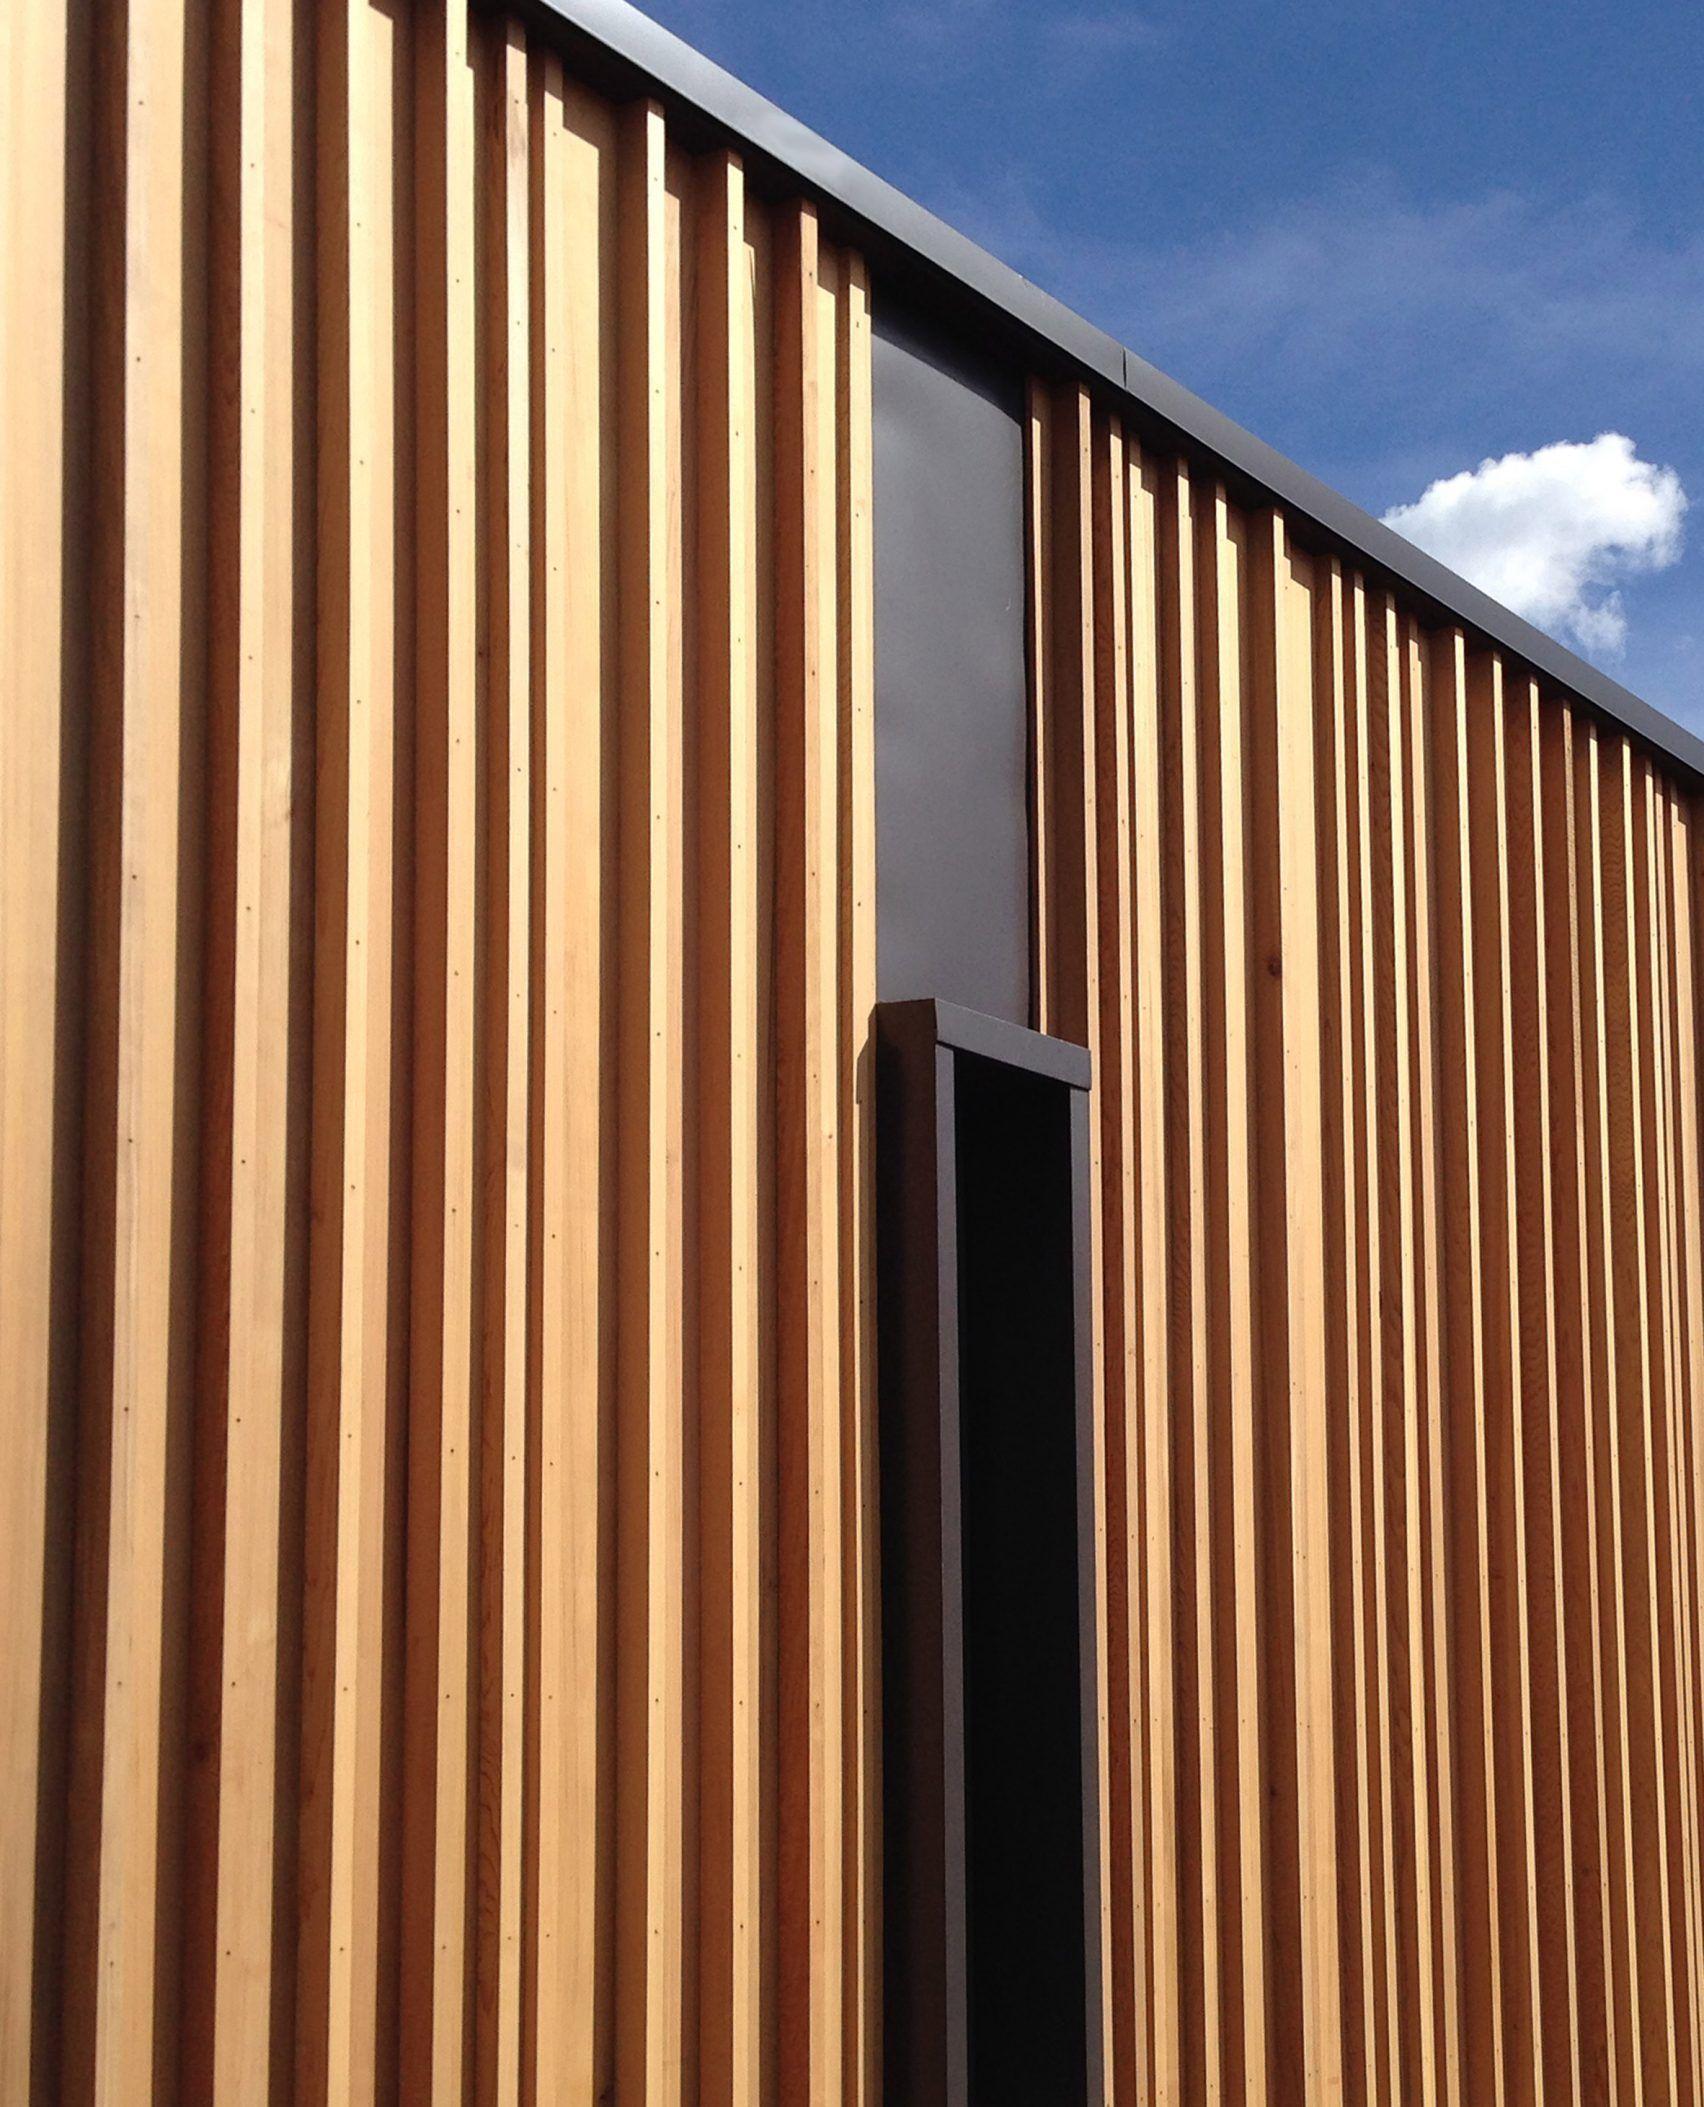 Studio B Builds Colorado School With Weathering Steel And Red Cedar Walls Cedar Walls Weathering Steel Red Cedar